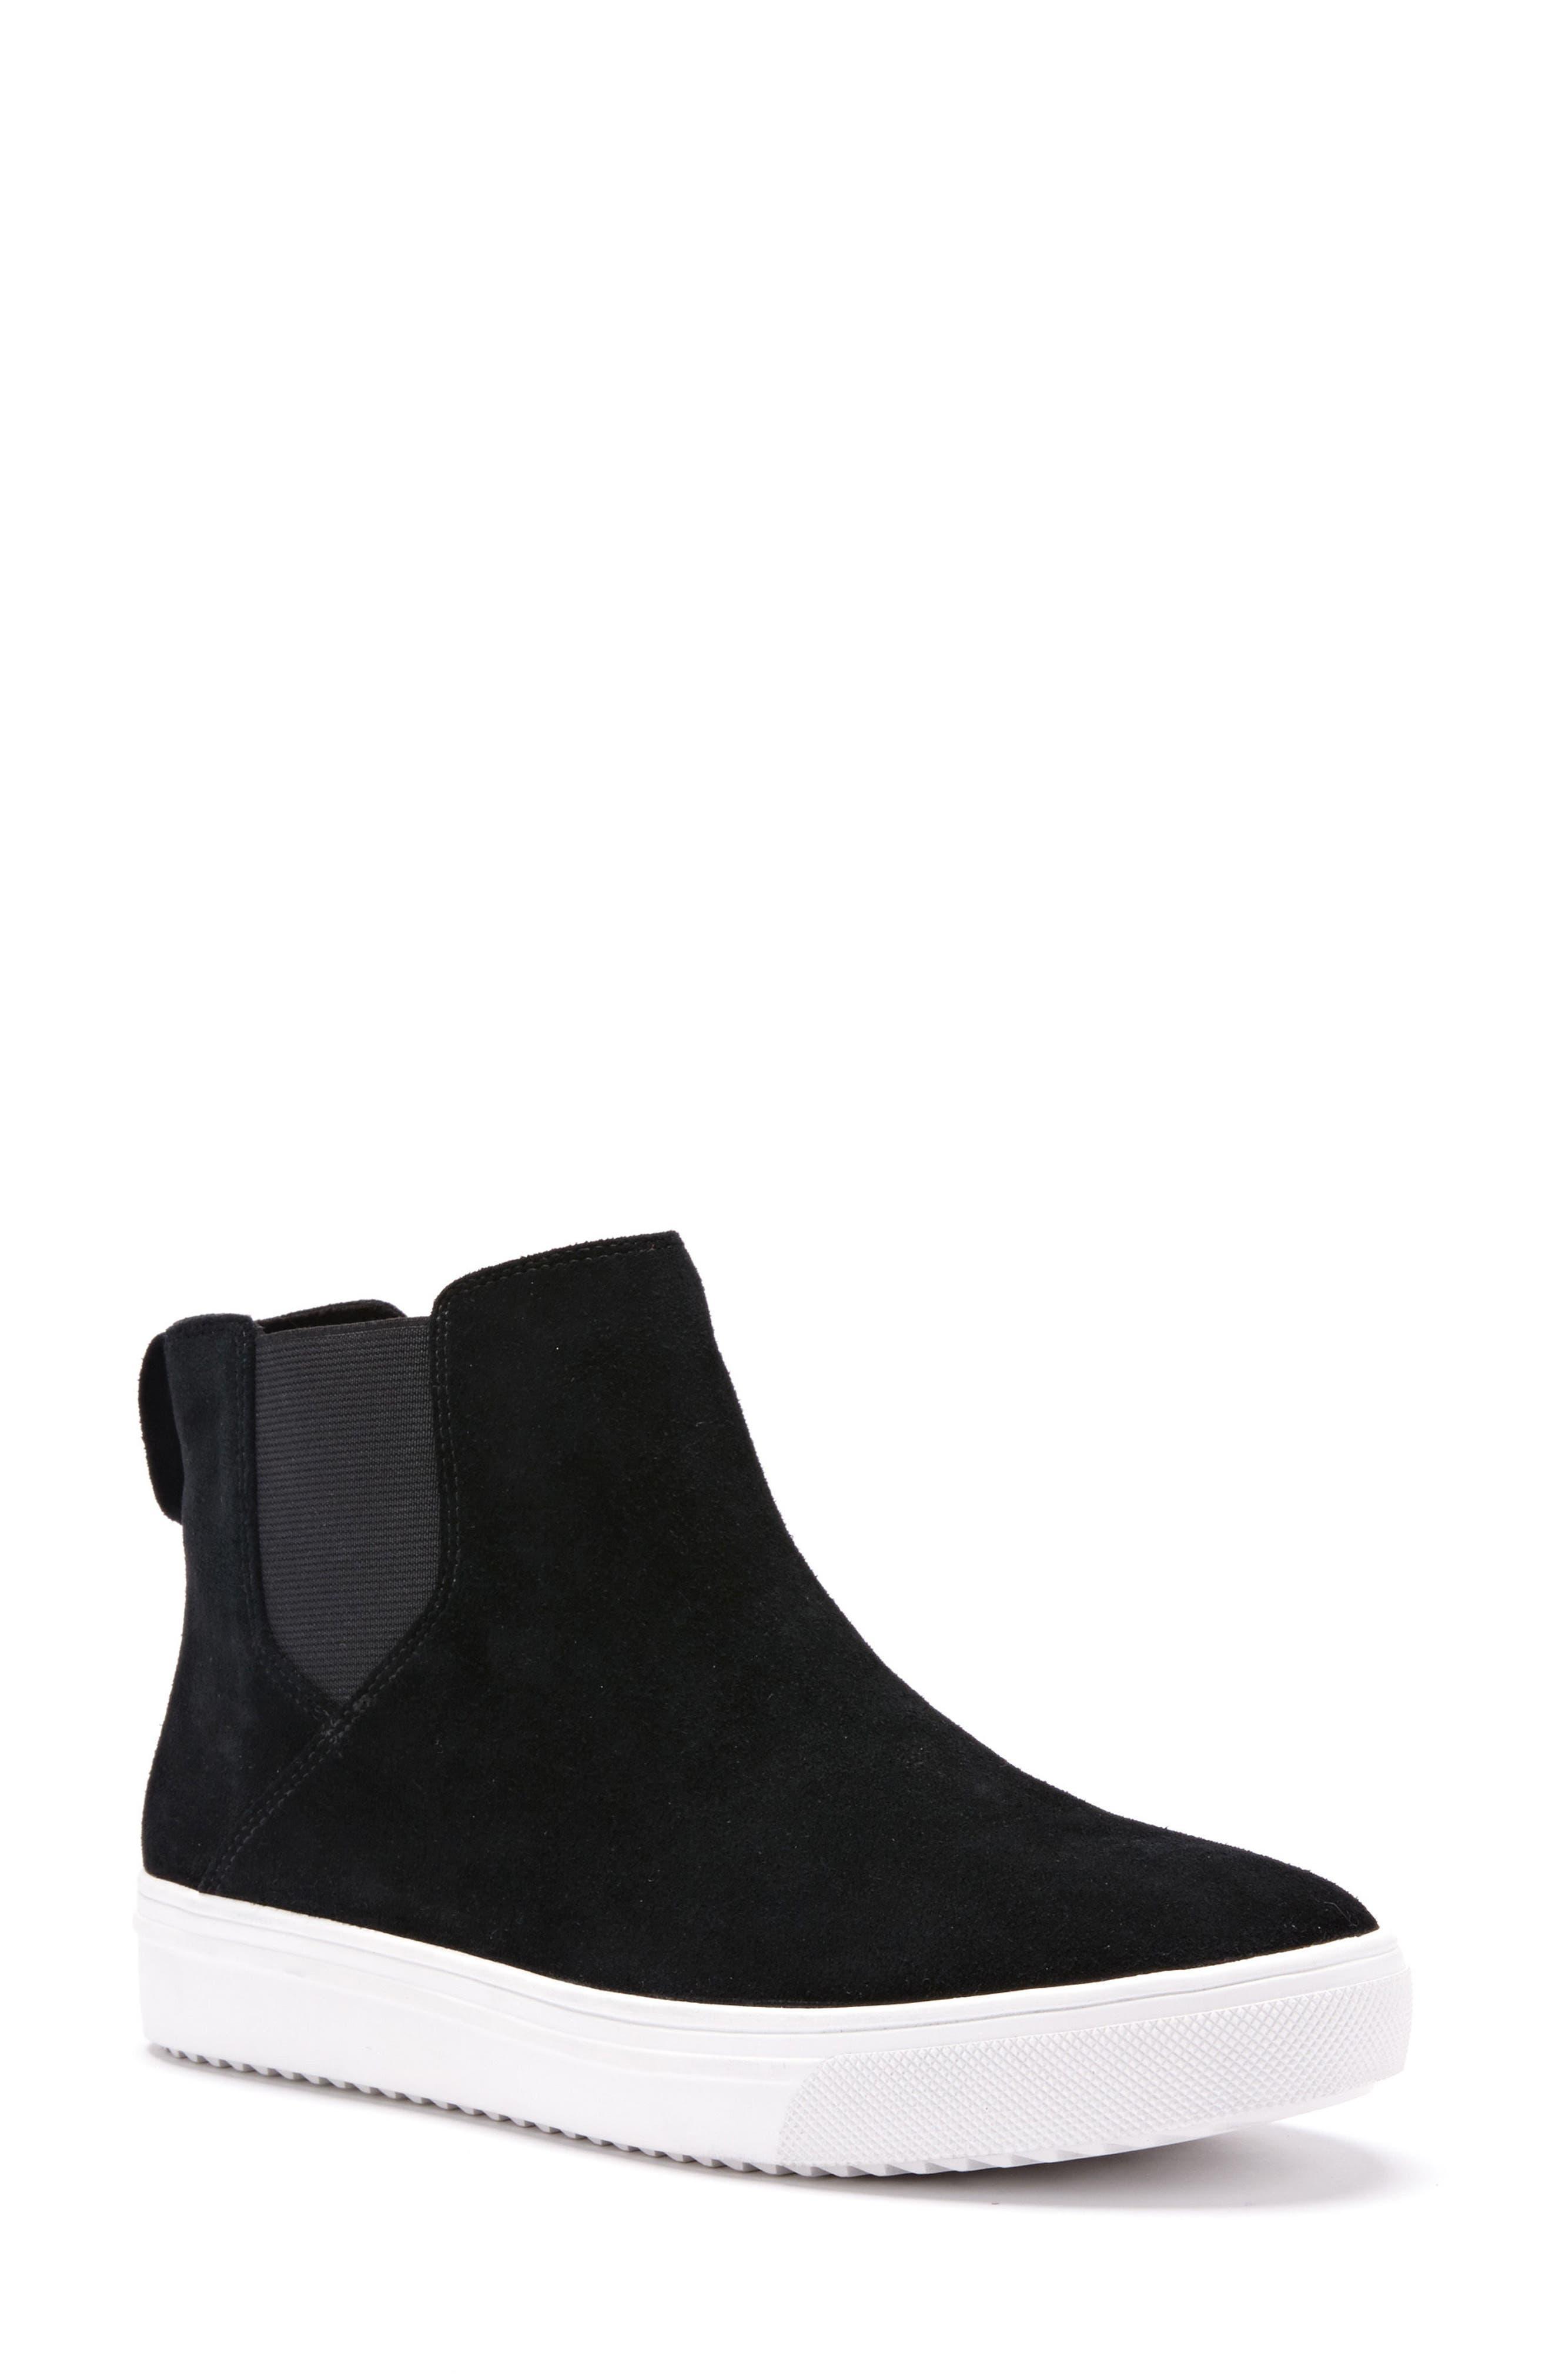 Womens Boots blondo black melody waterproof dm6w62a3